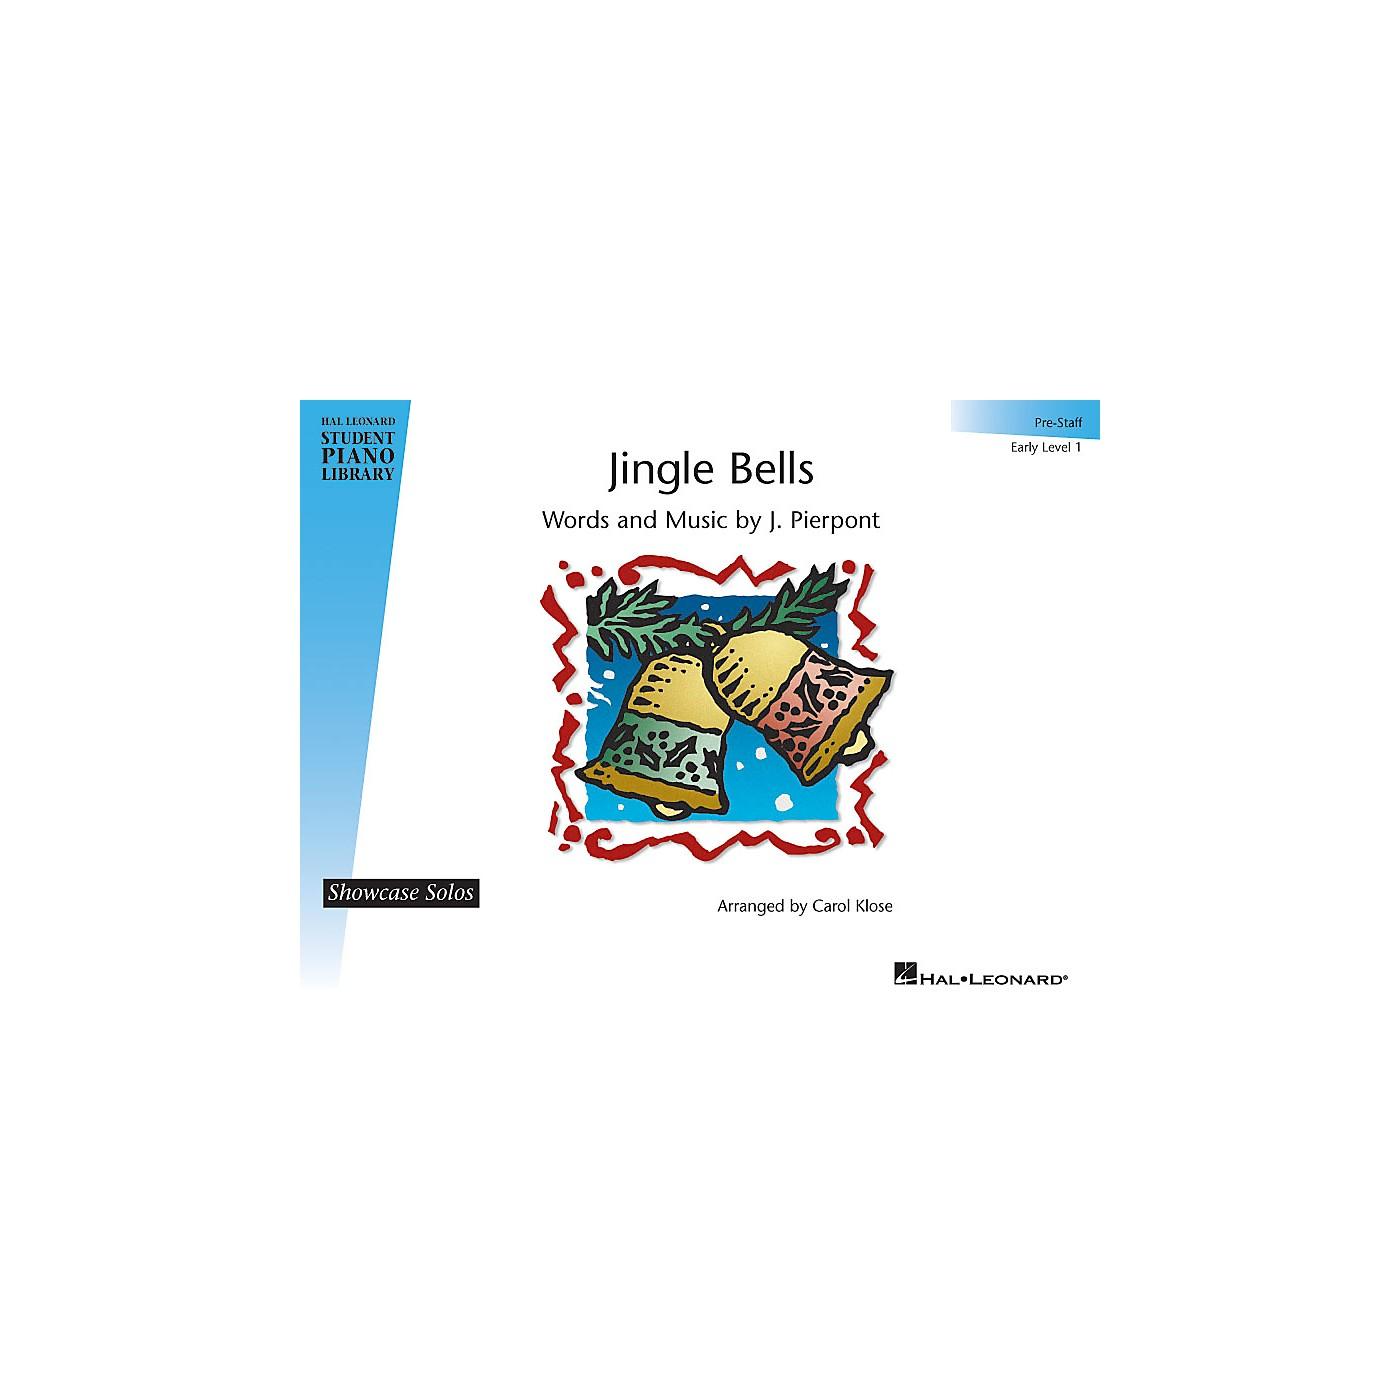 Hal Leonard Jingle Bells Piano Library Series by J. Pierpont (Level Early Elem (Pre-Staff)) thumbnail